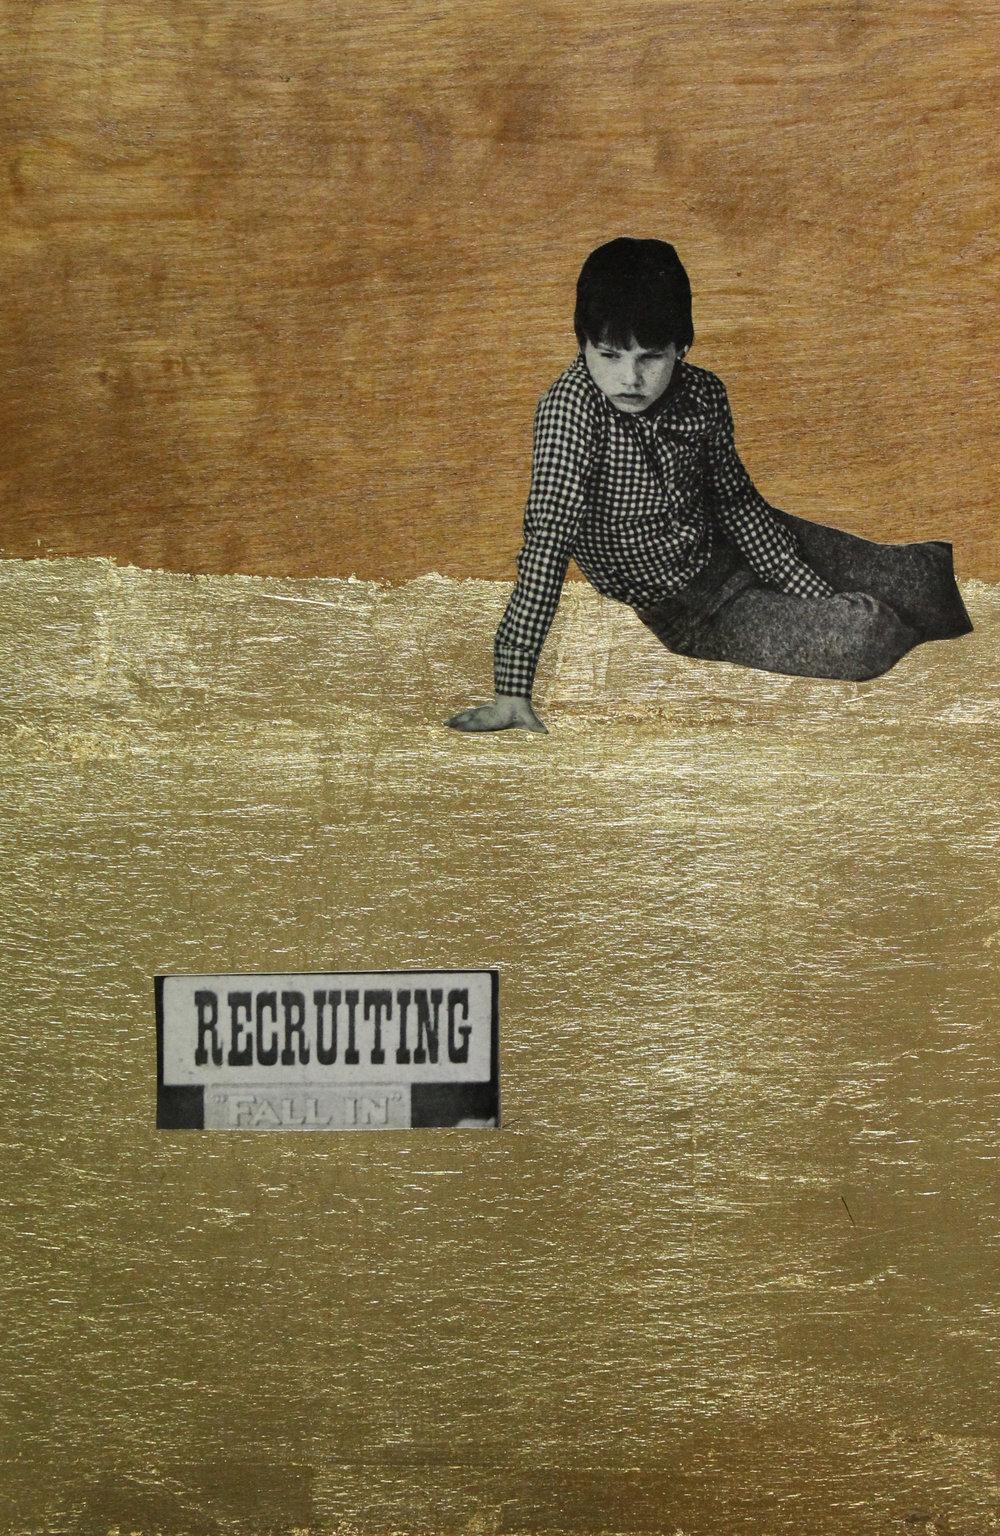 recruiting 2.jpg